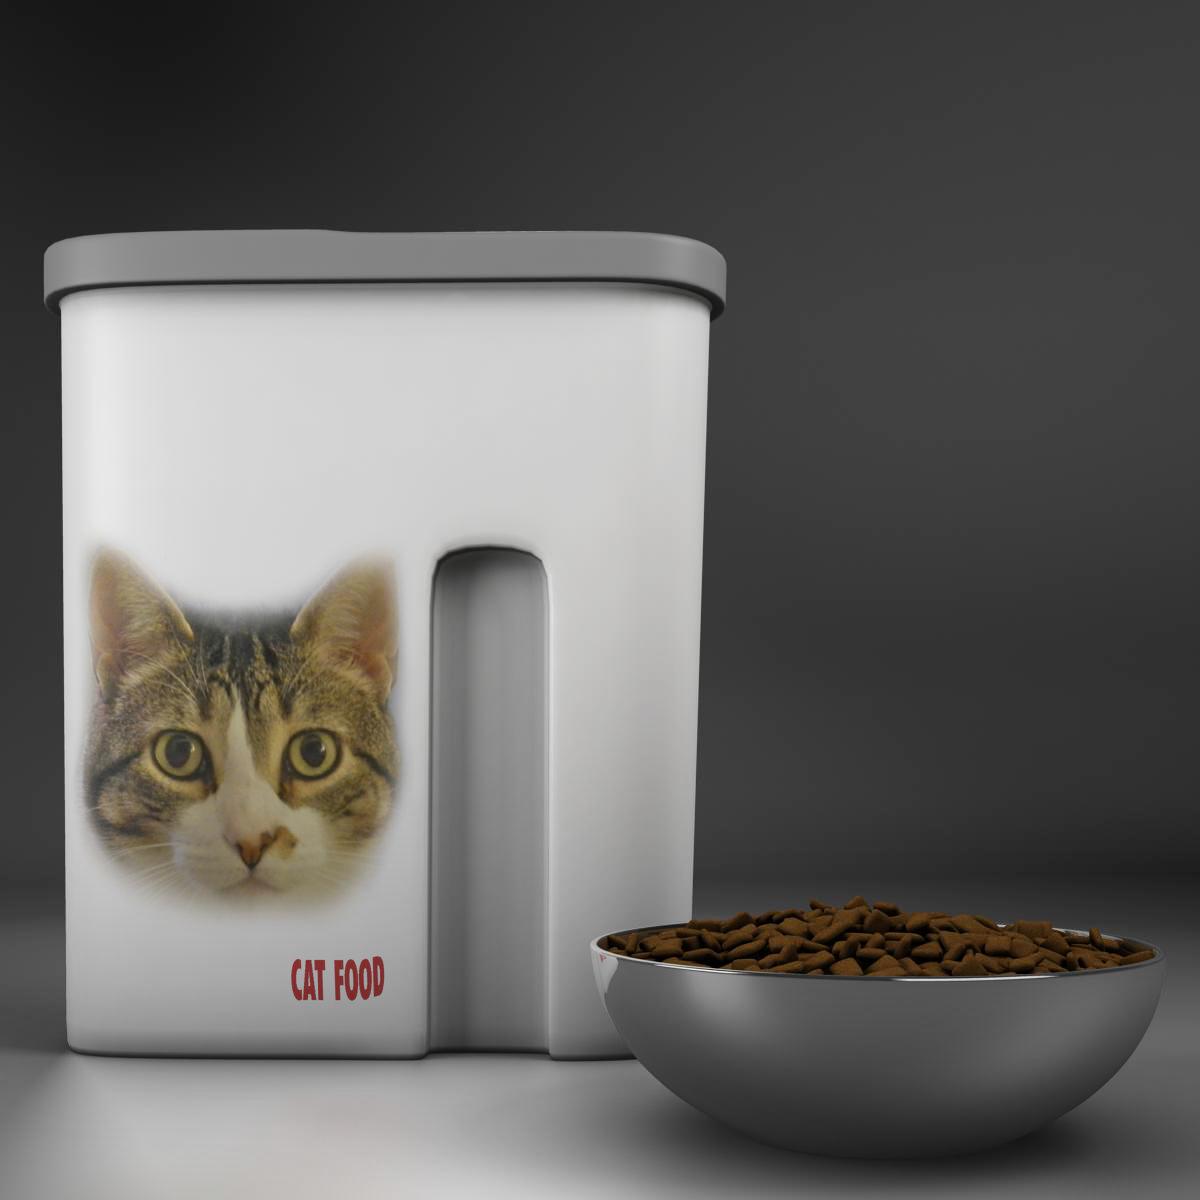 kaķu barība 3d modelis 3ds max fbx c4d ma mb obj 159456